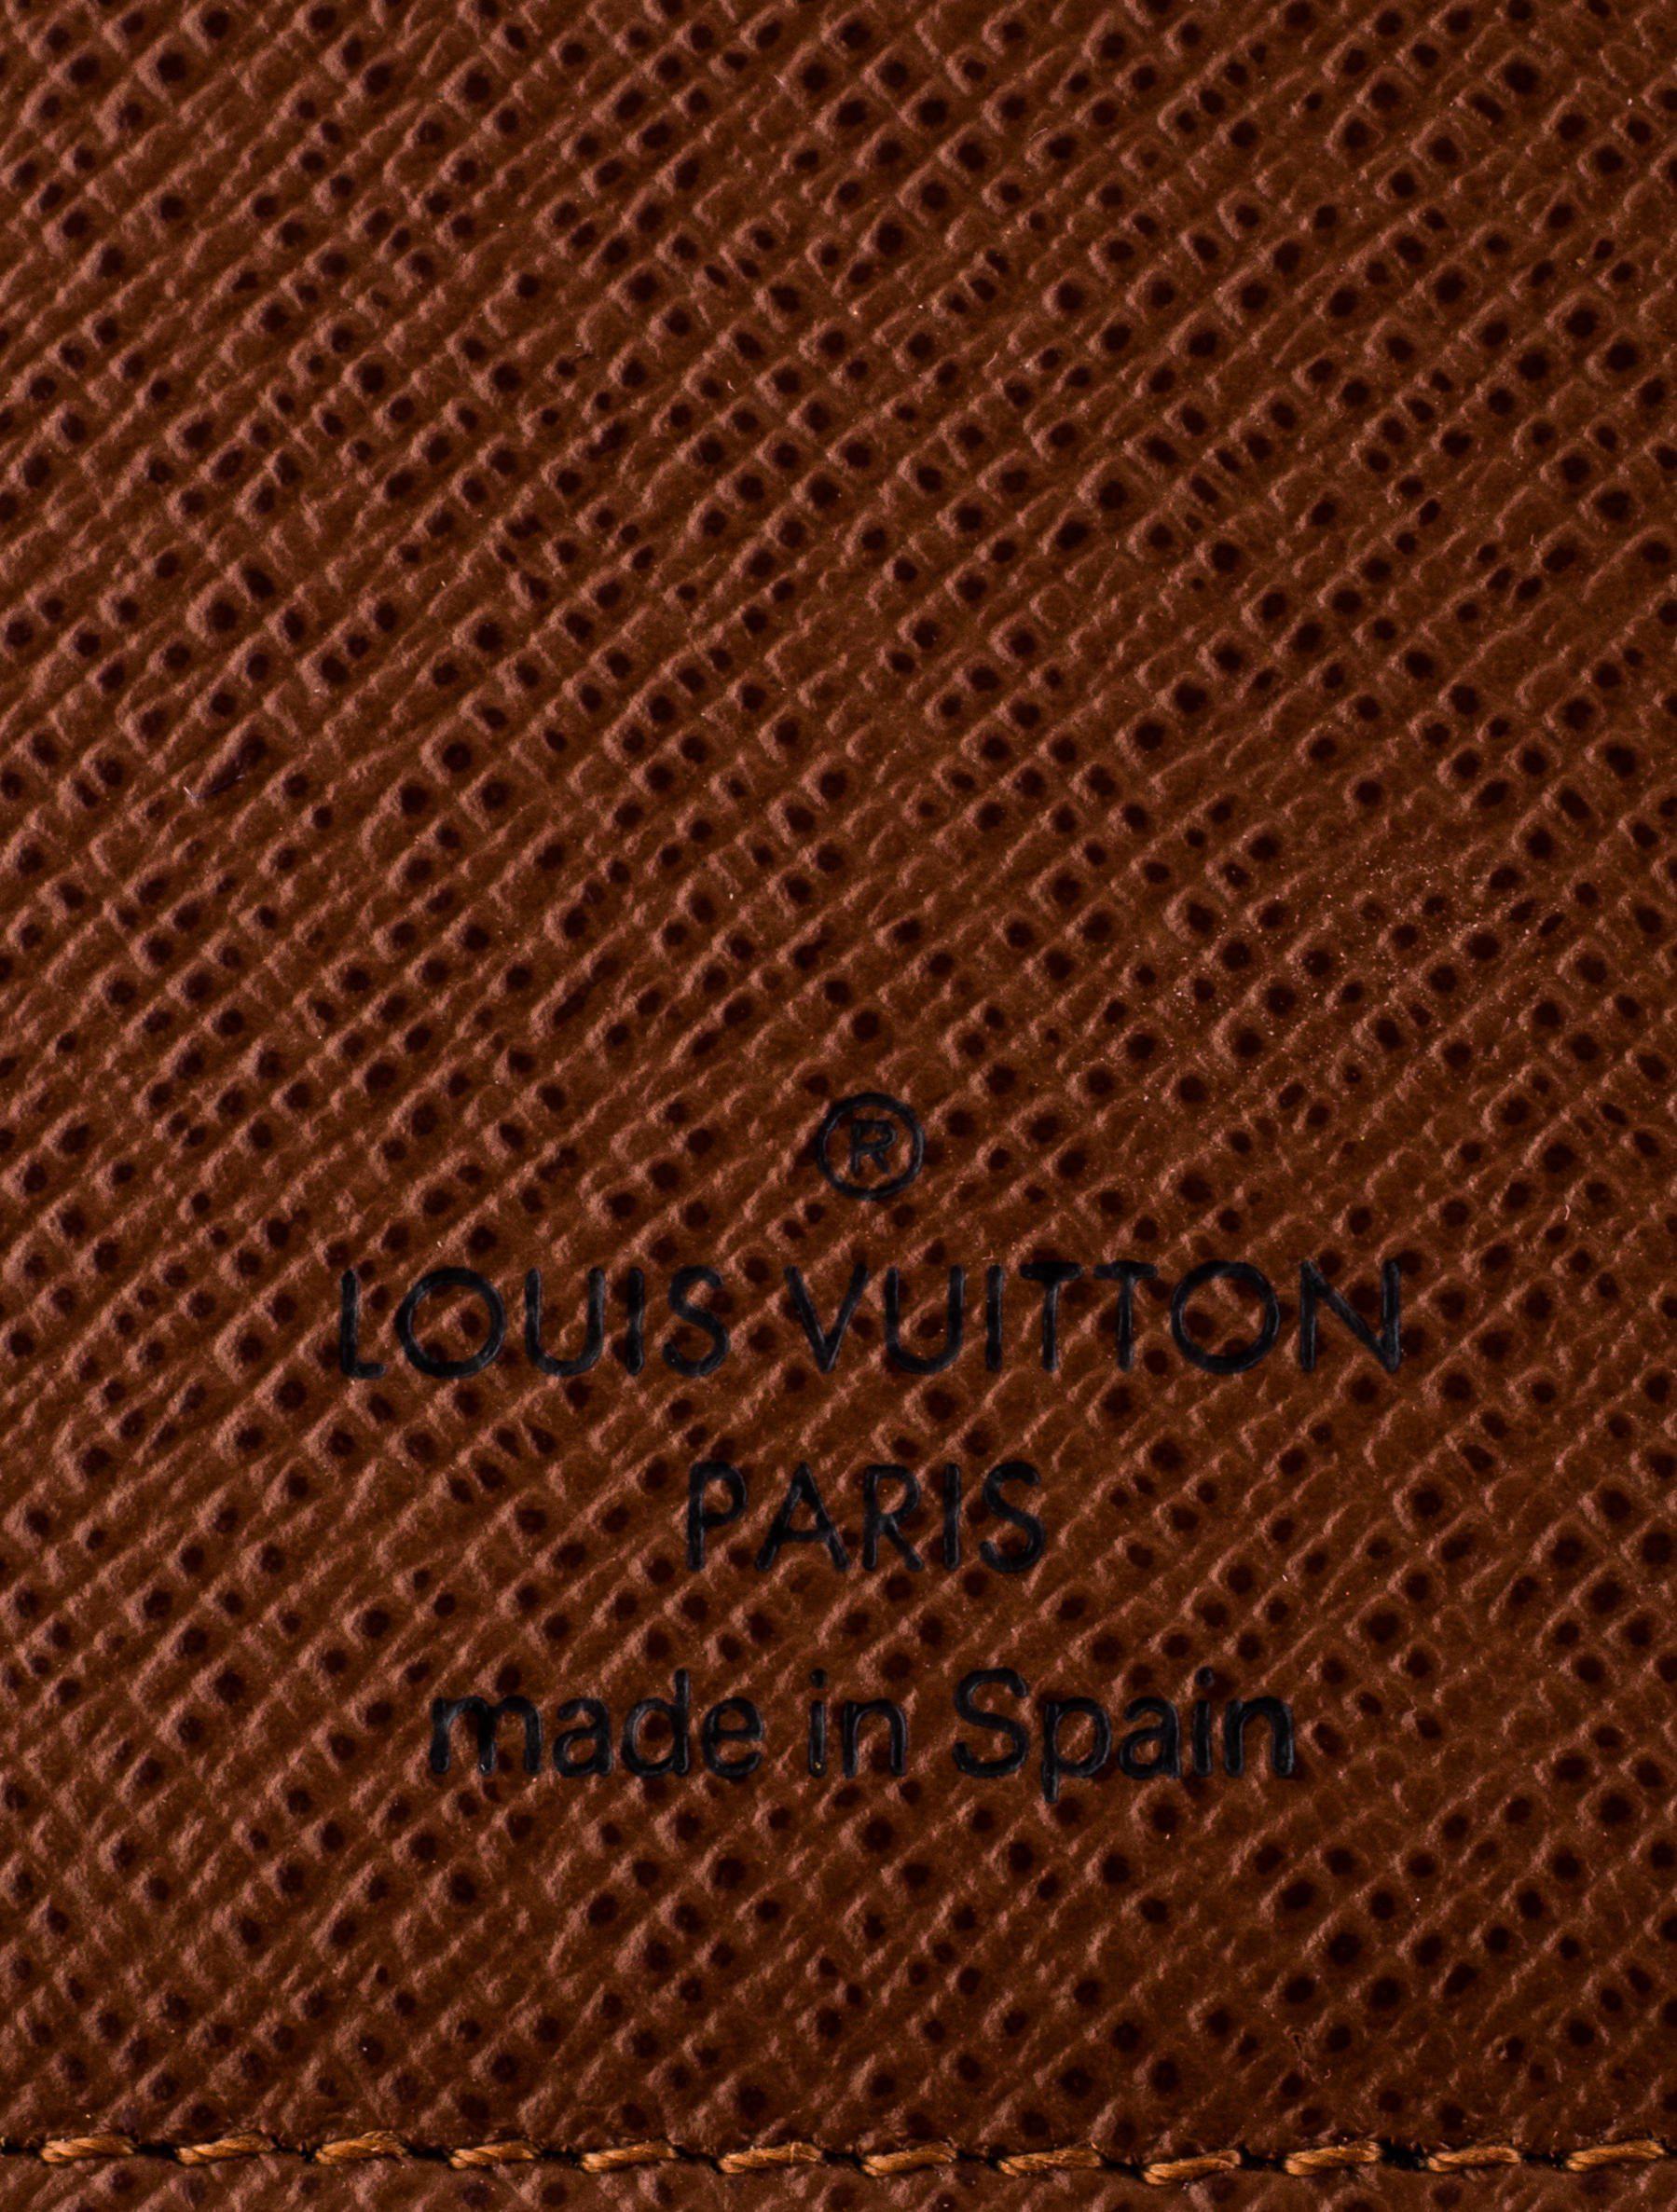 89ed379c96d2 Lyst - Louis Vuitton Monogram Desk Agenda Cover Brown in Natural